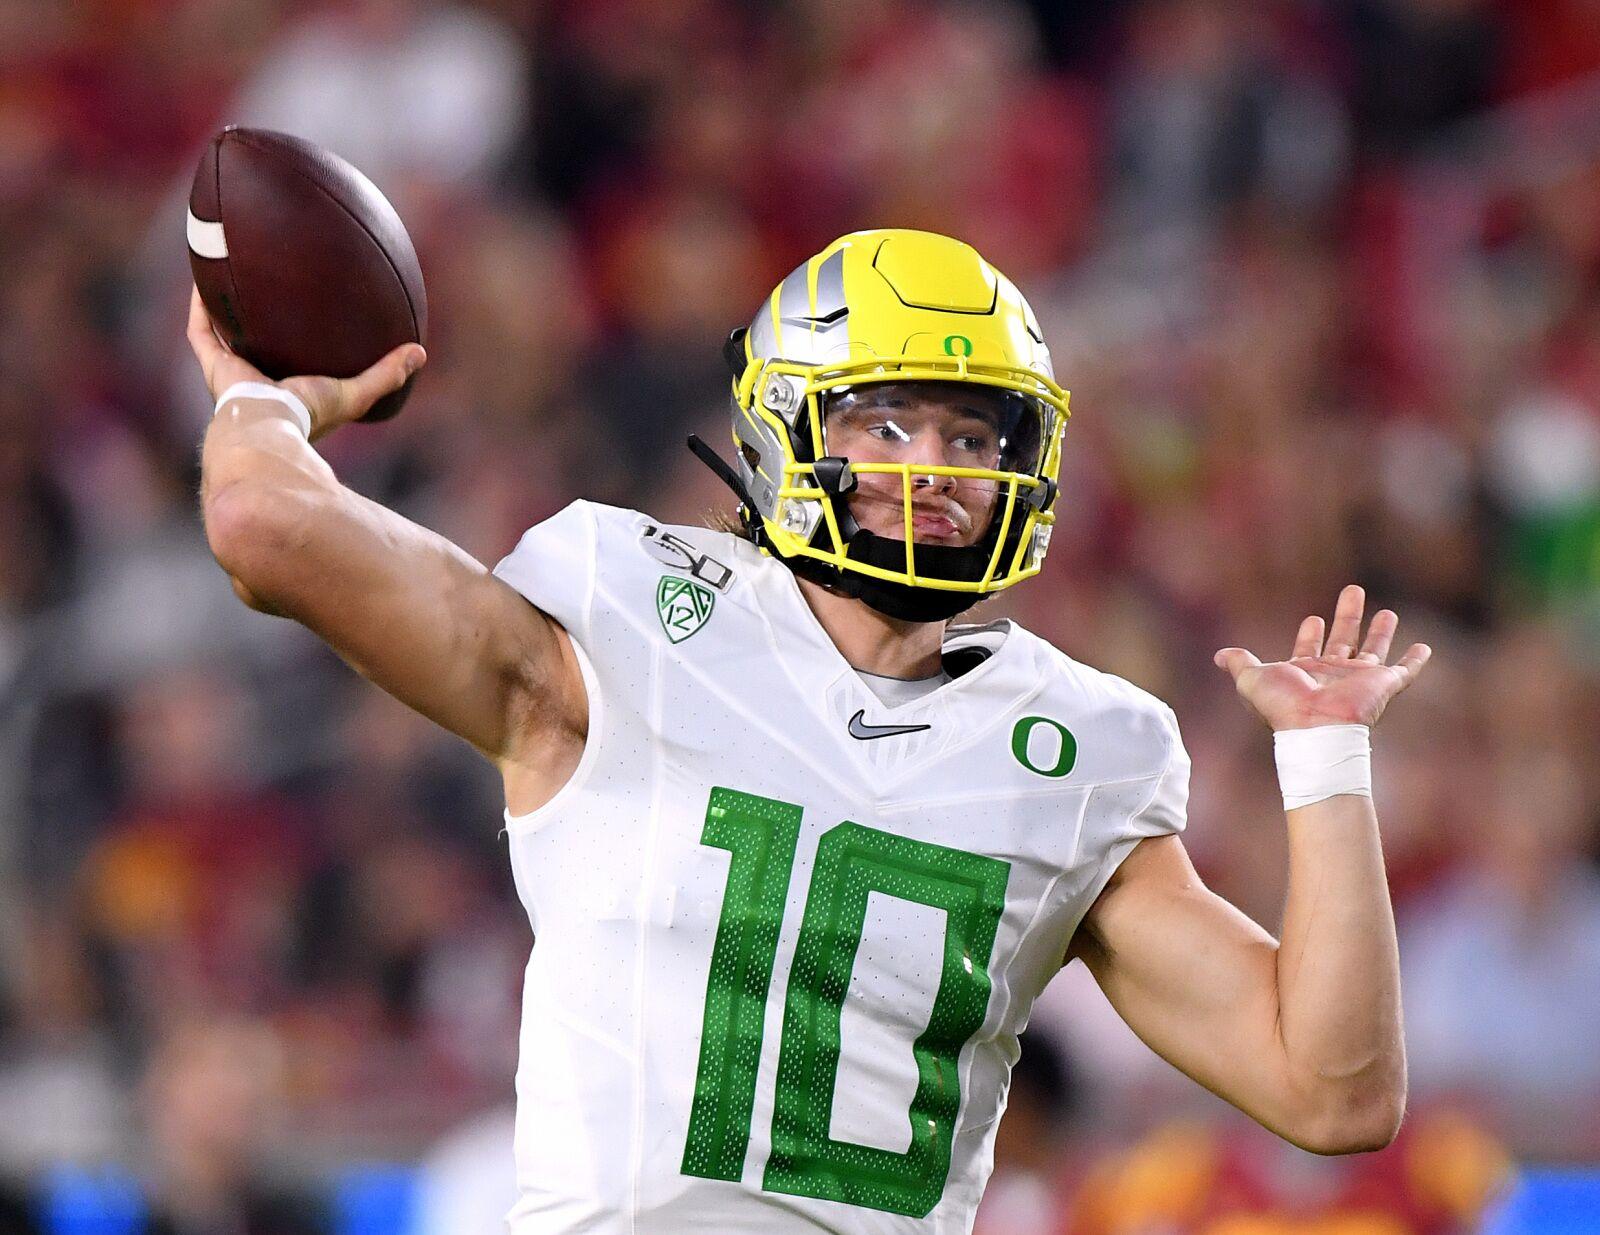 Oregon Football: Ducks Need to Make Playoff Statement - Autzen Zoo